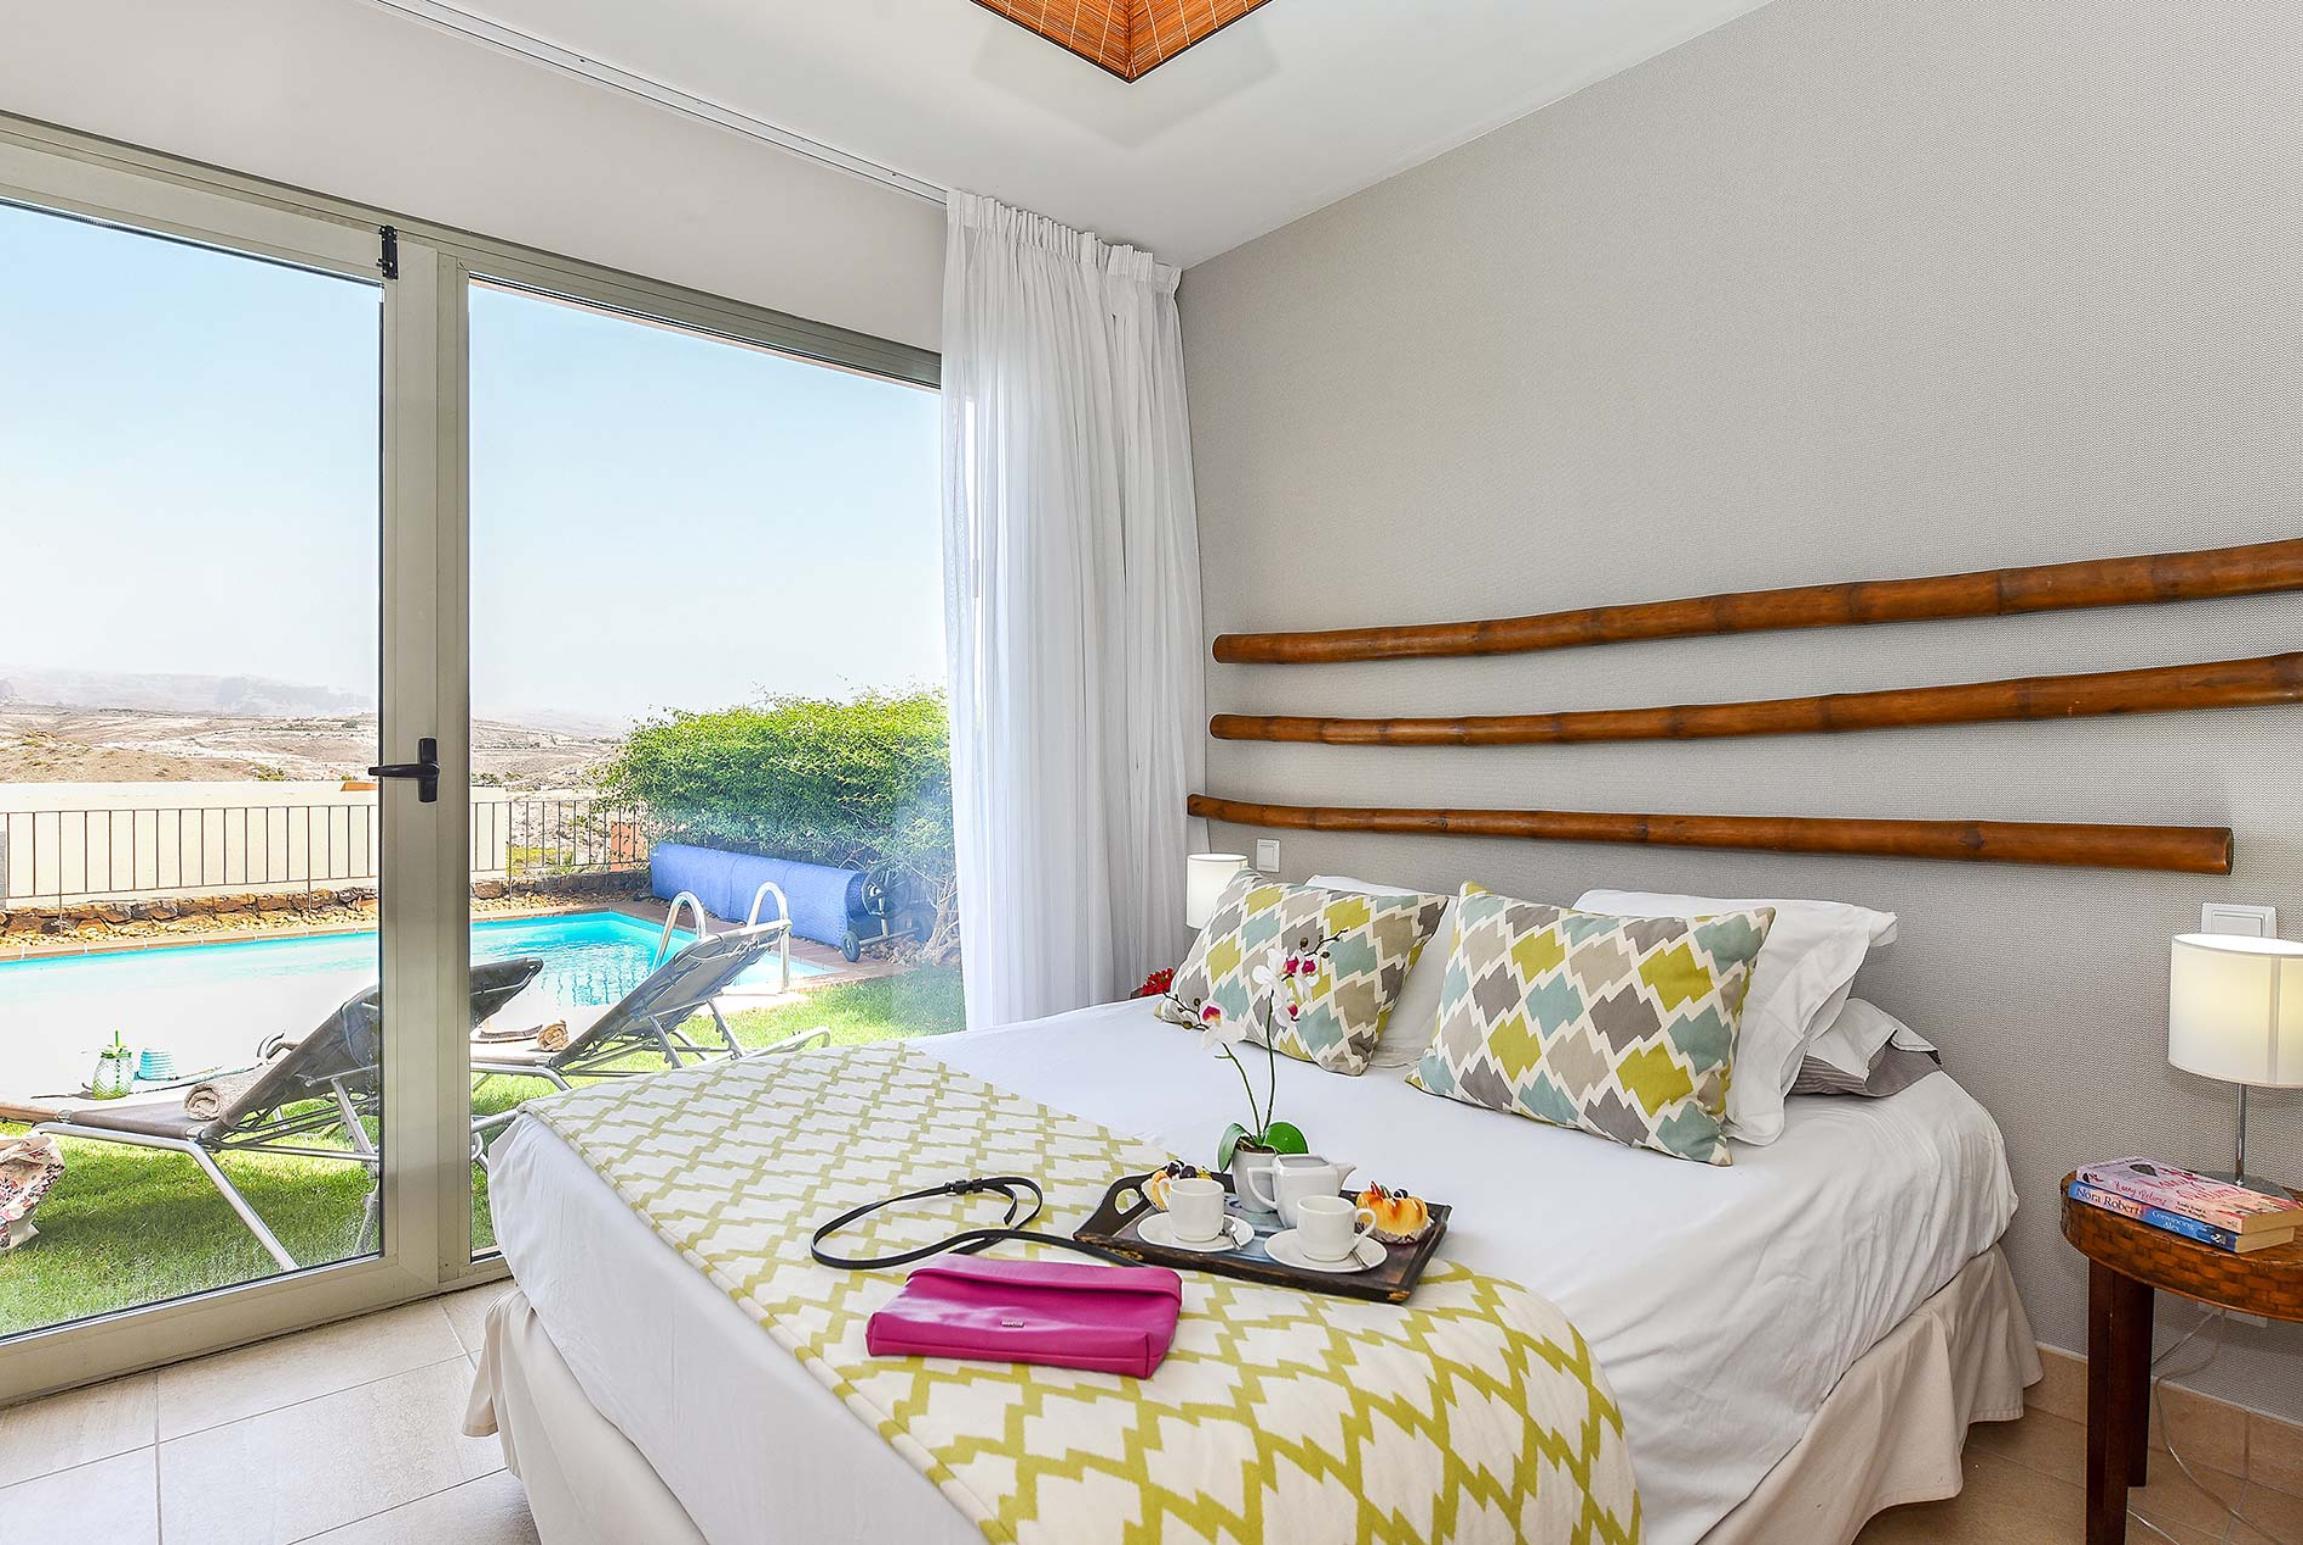 Holiday house Par 4 Villa 3 (2653981), Maspalomas, Gran Canaria, Canary Islands, Spain, picture 6